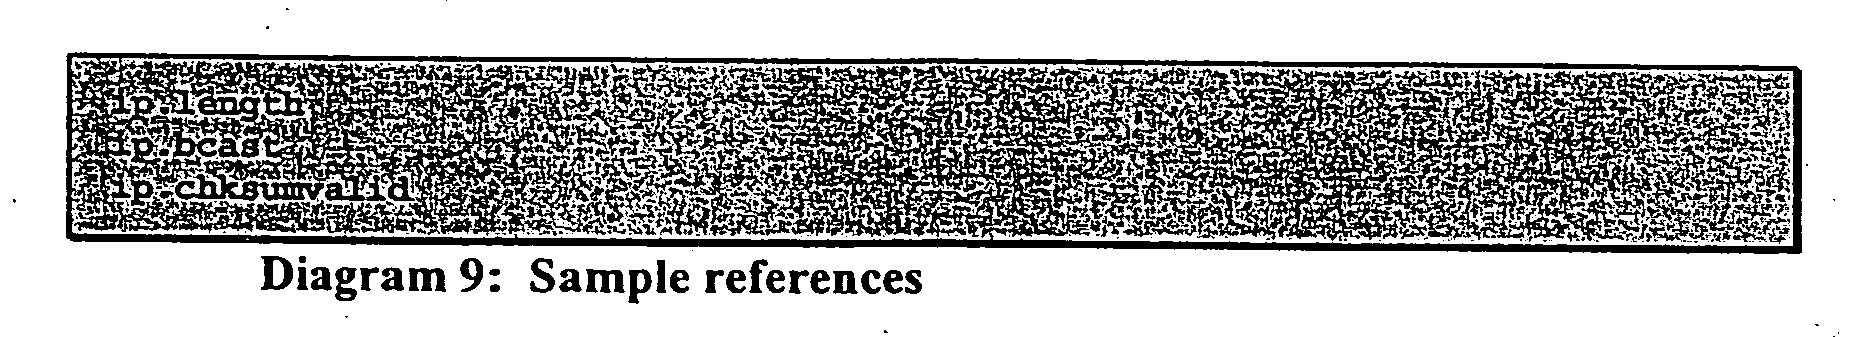 Figure US20040148382A1-20040729-P00011